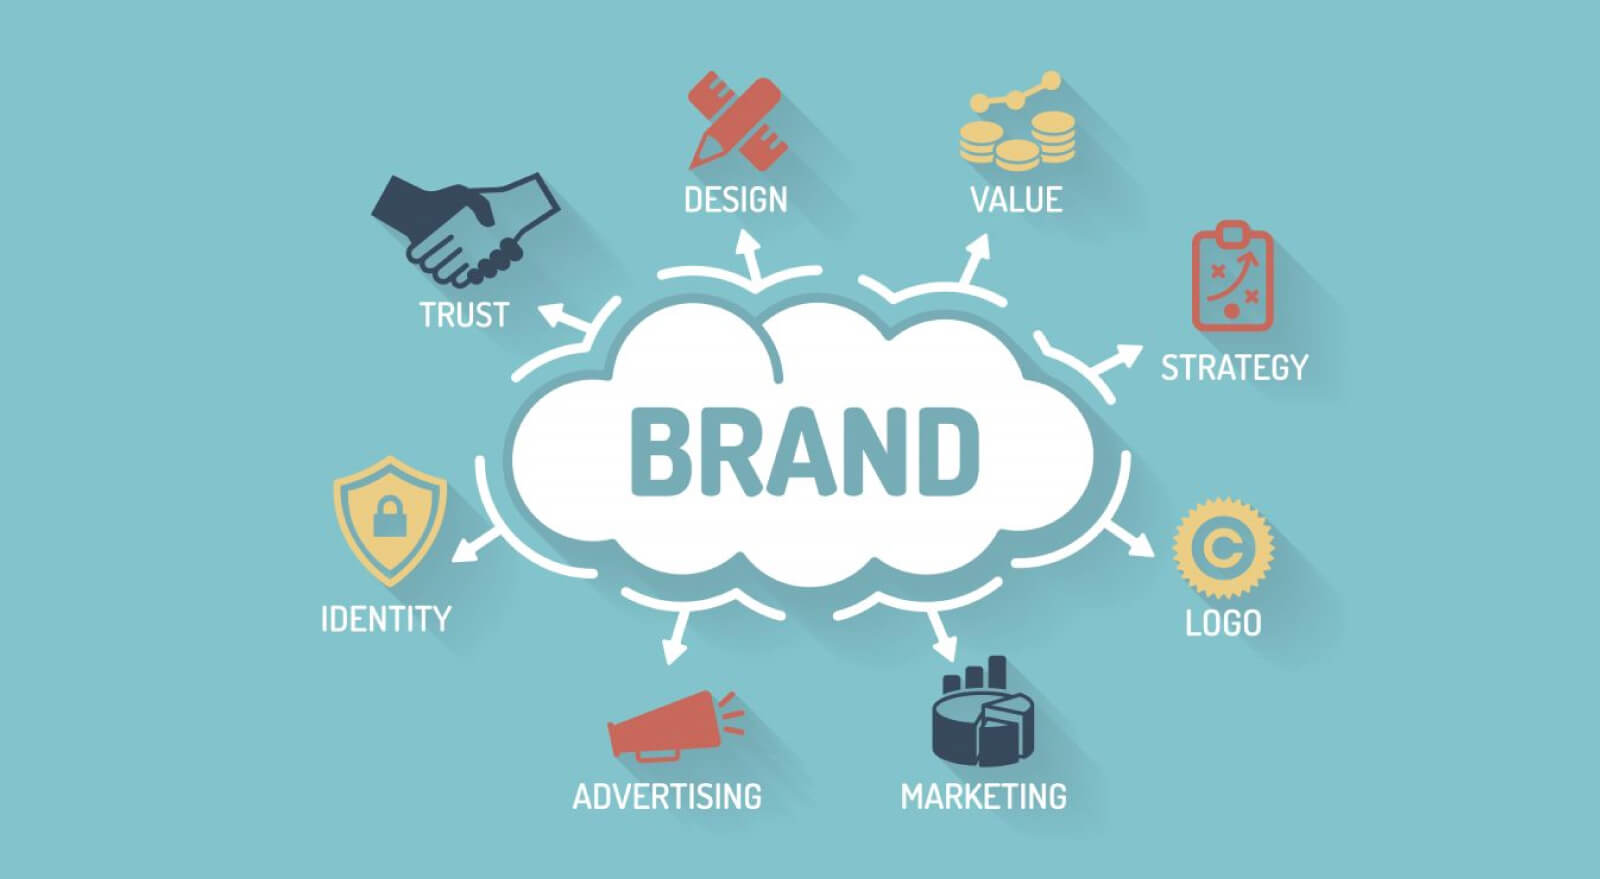 3. brand identity